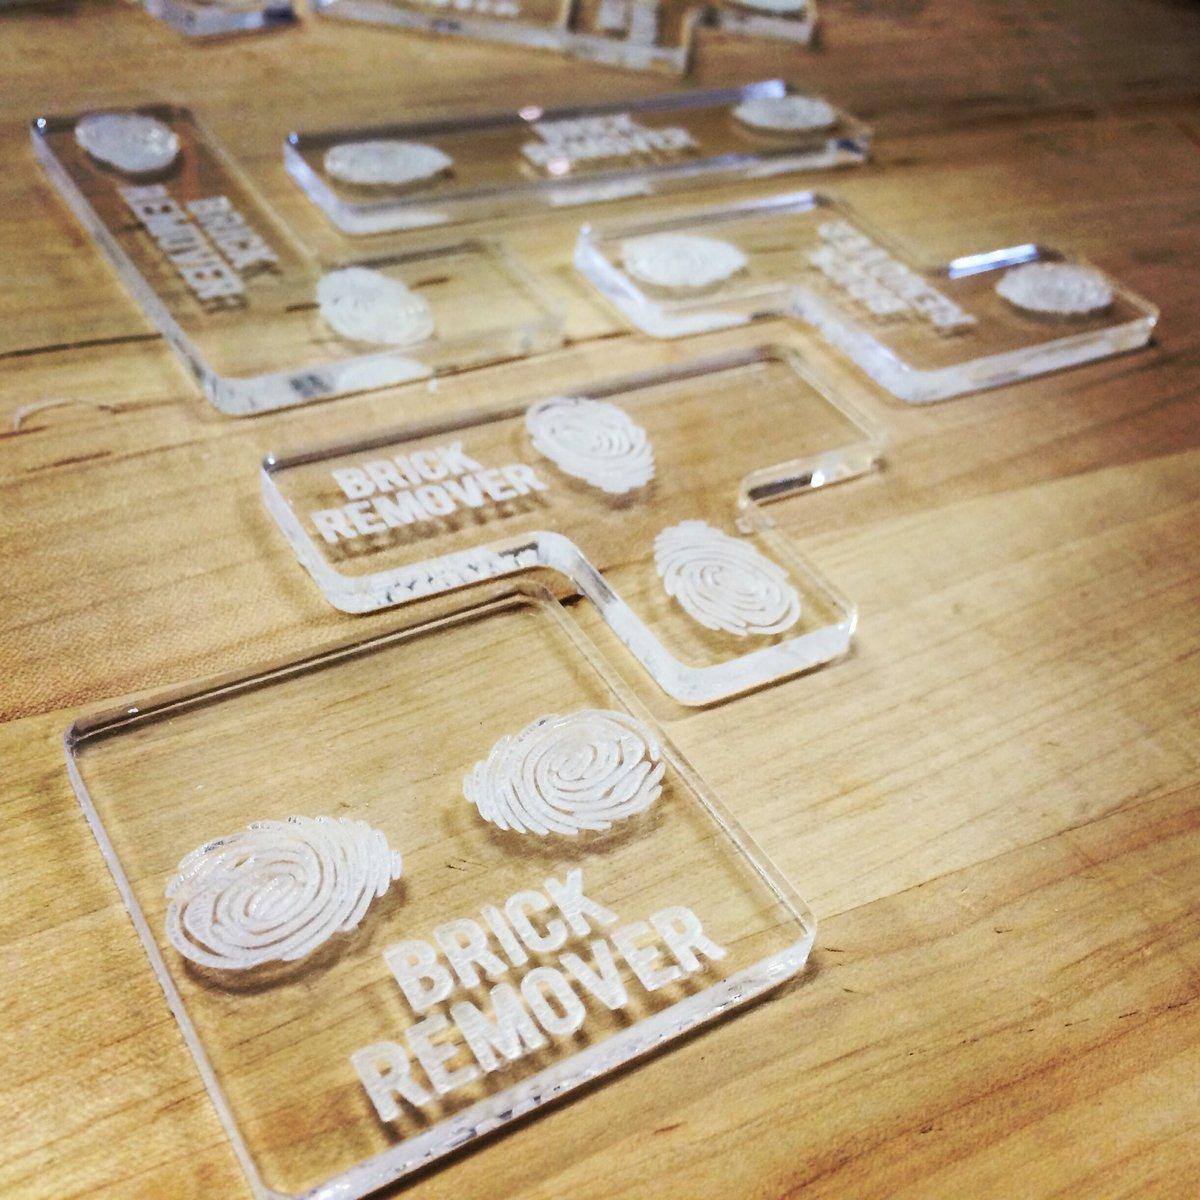 It is starting to come together! #tetris #laser #mushroombricks #mycelium #prototype #biodesignstudio https://t.co/bJZIIFVmuk